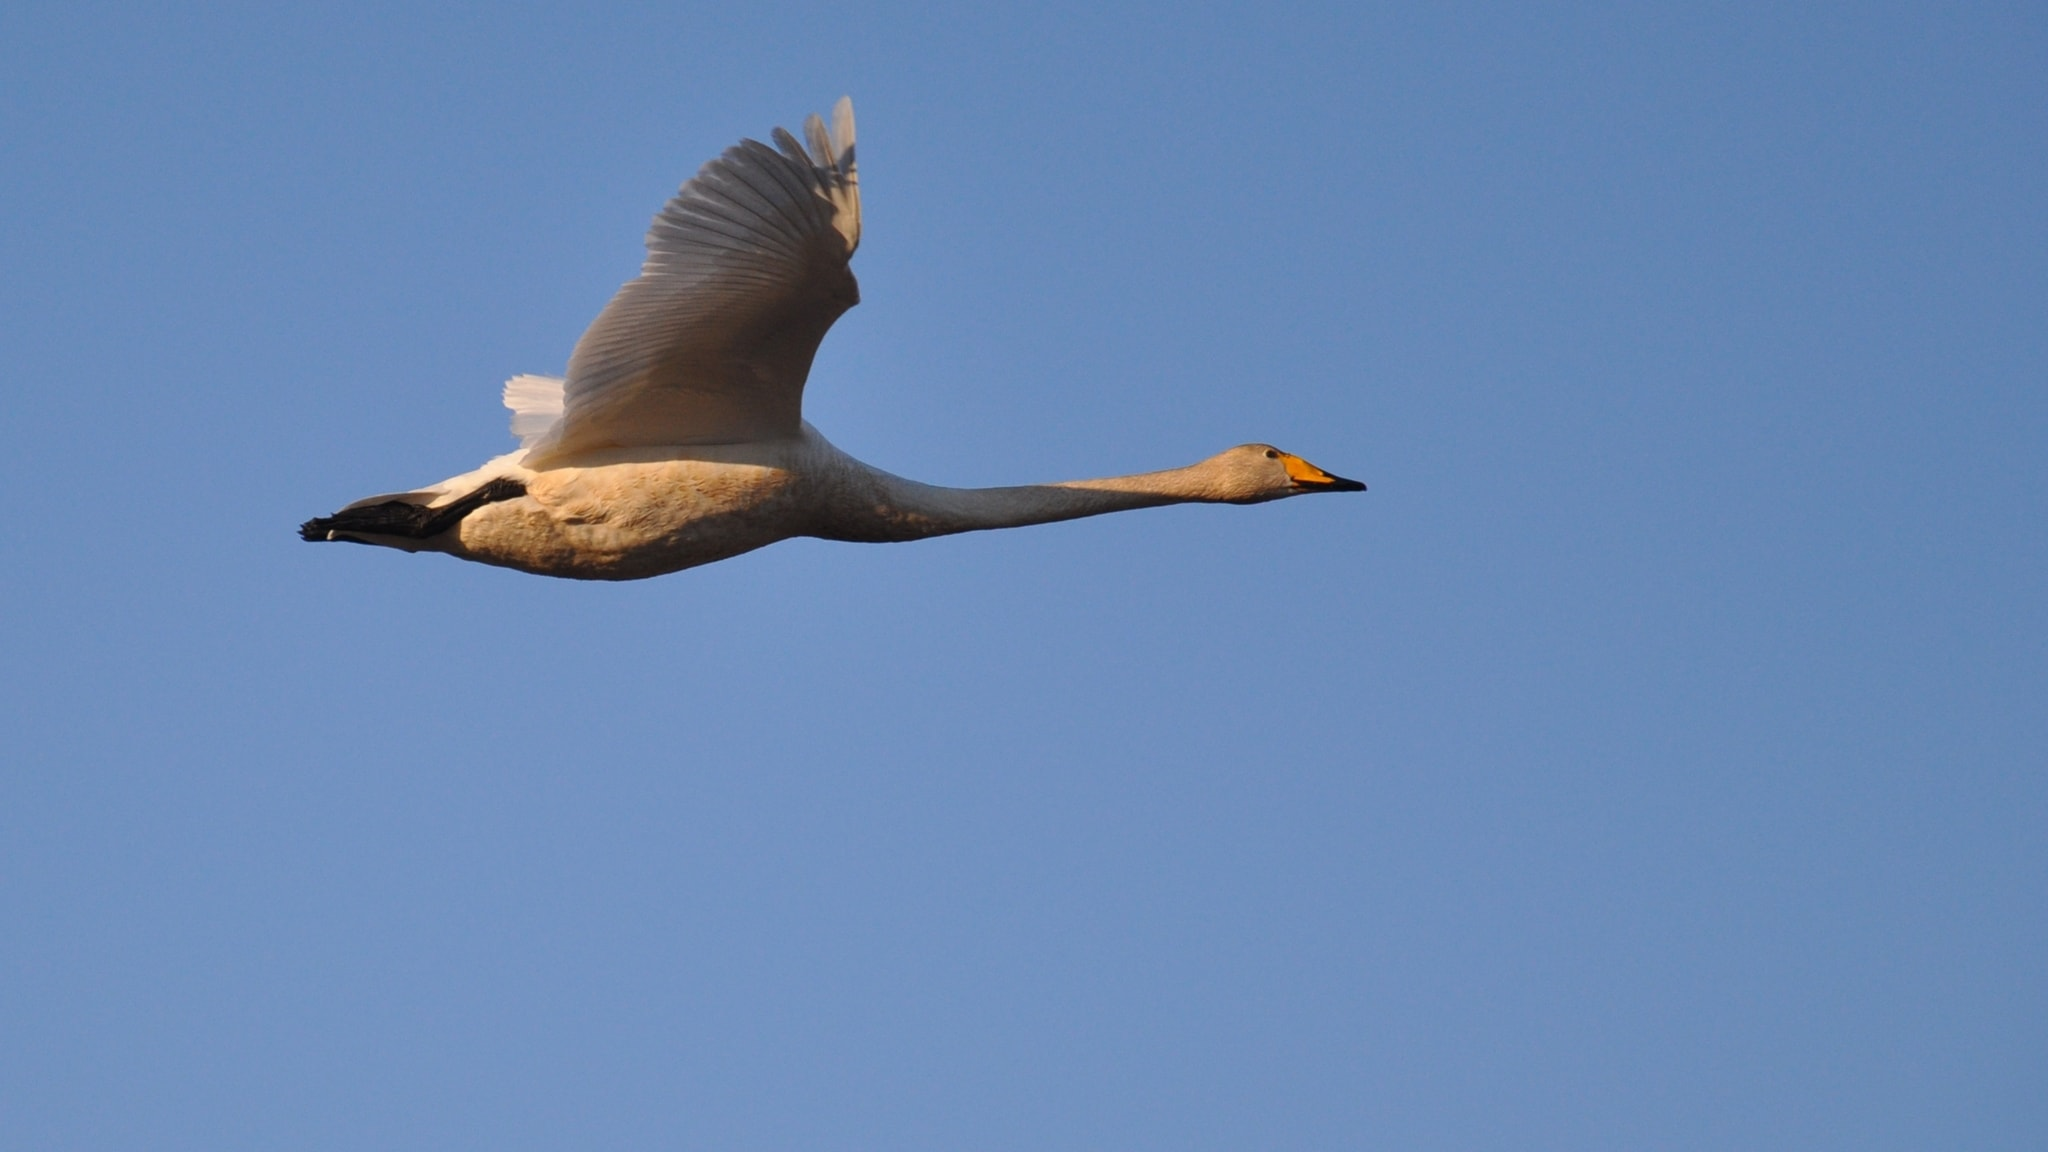 Lennäpä lintu